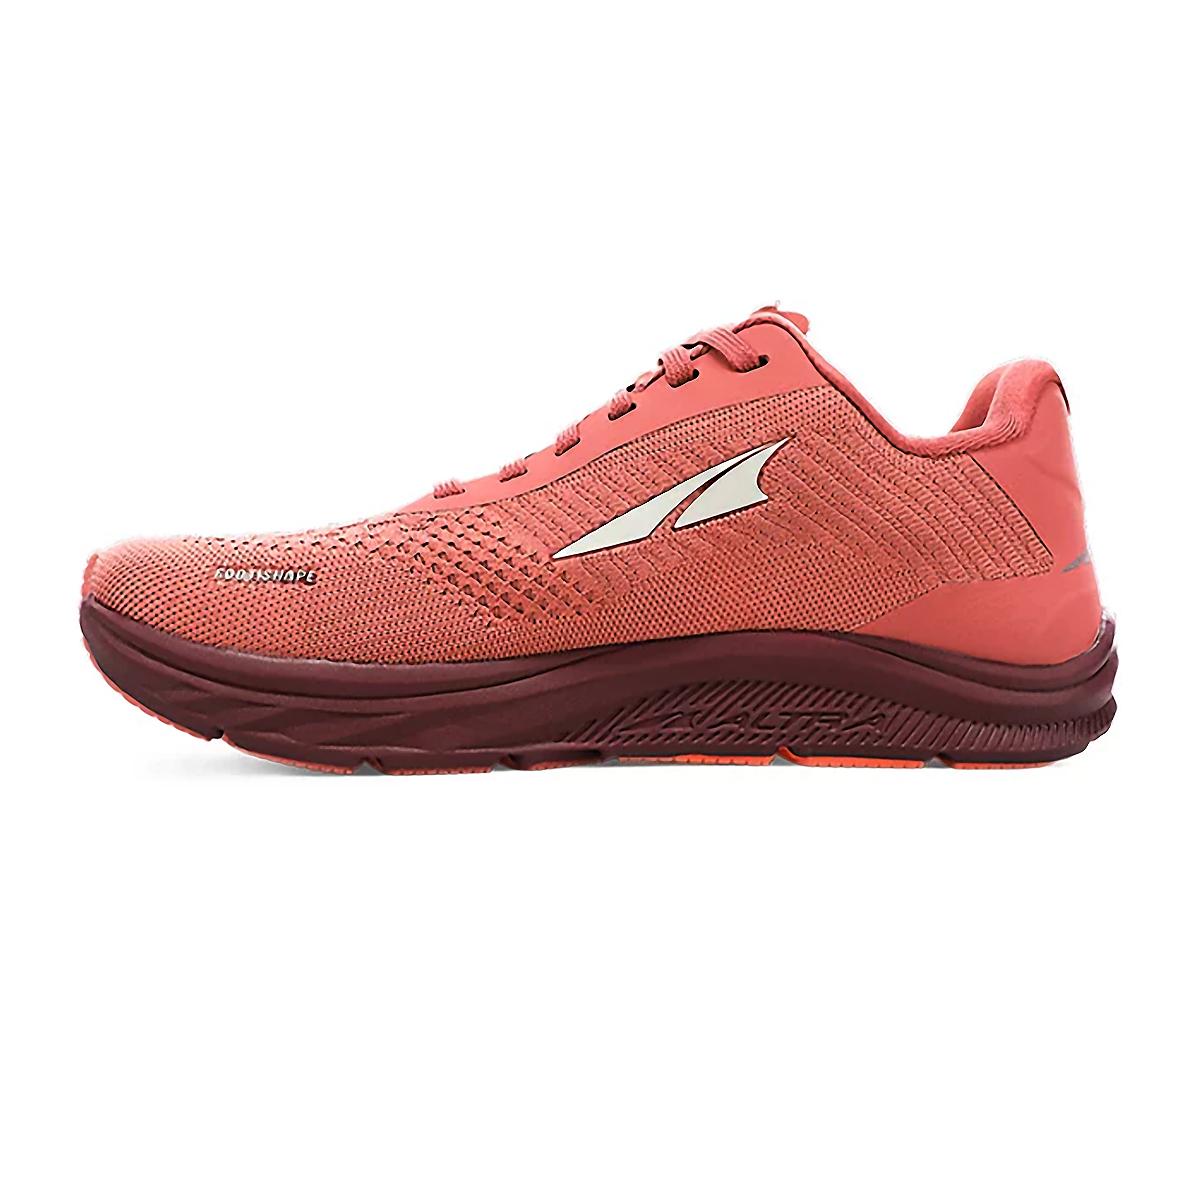 Women's Altra Torin 4.5 Plush Running Shoe - Color: Misty Rose - Size: 5.5 - Width: Regular, Misty Rose, large, image 2